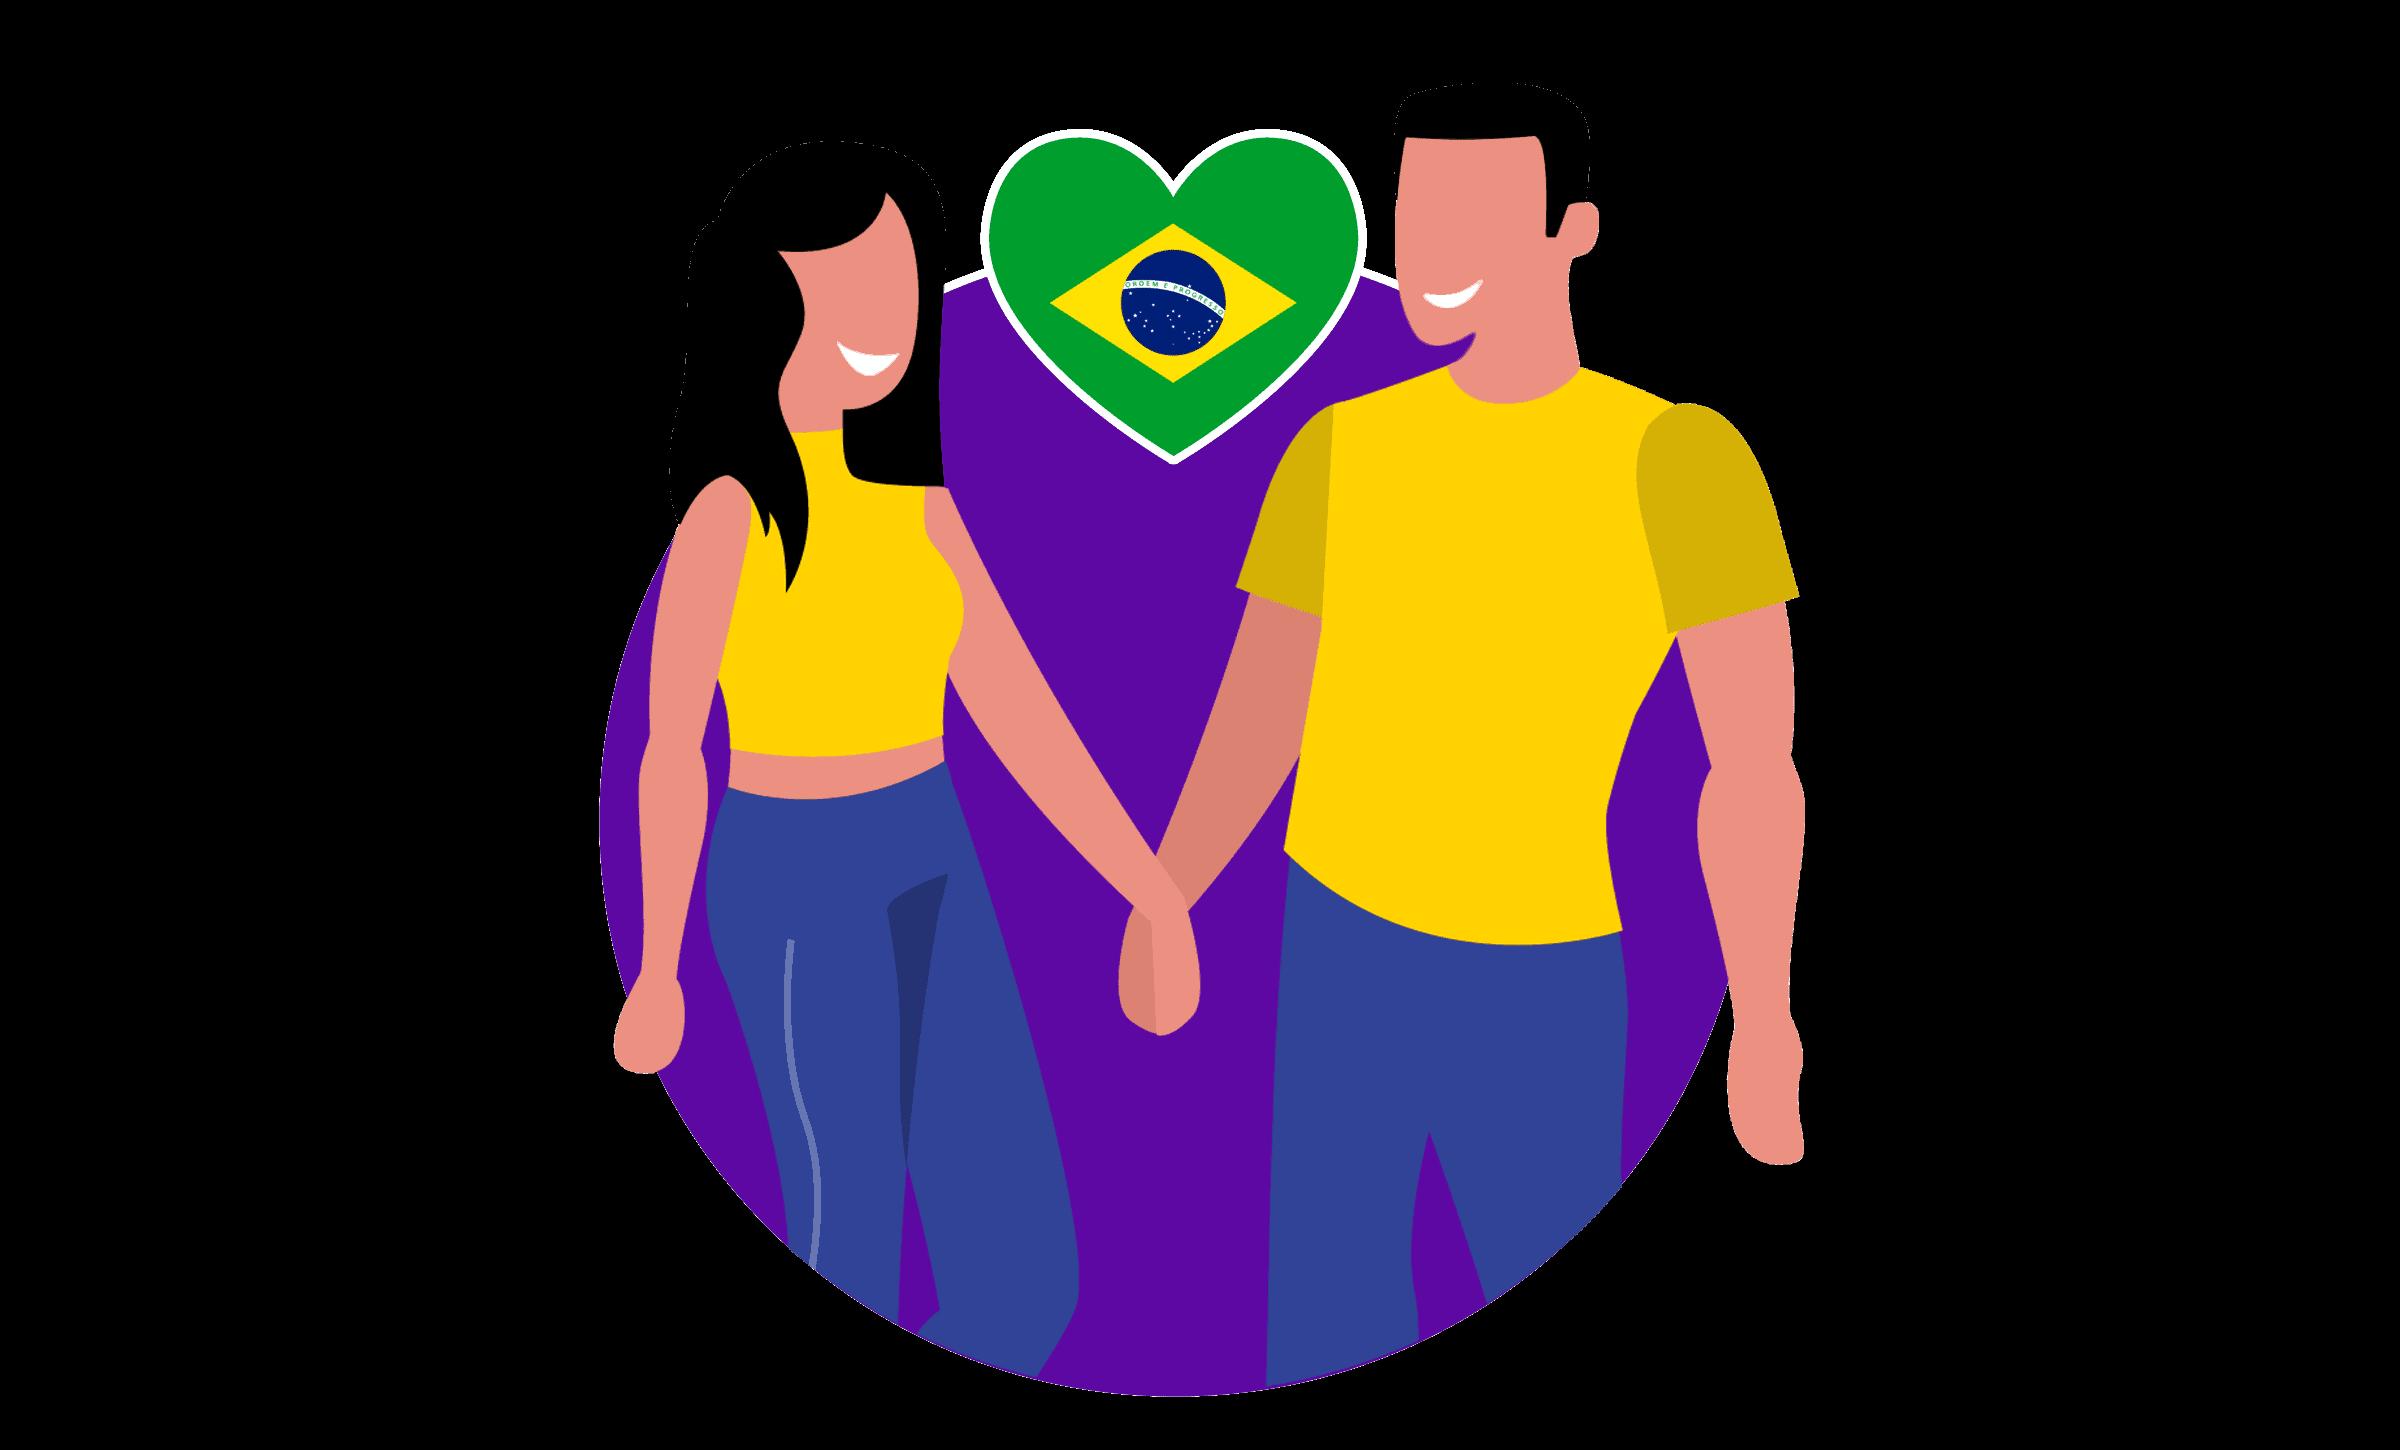 inele de dating braziliane)